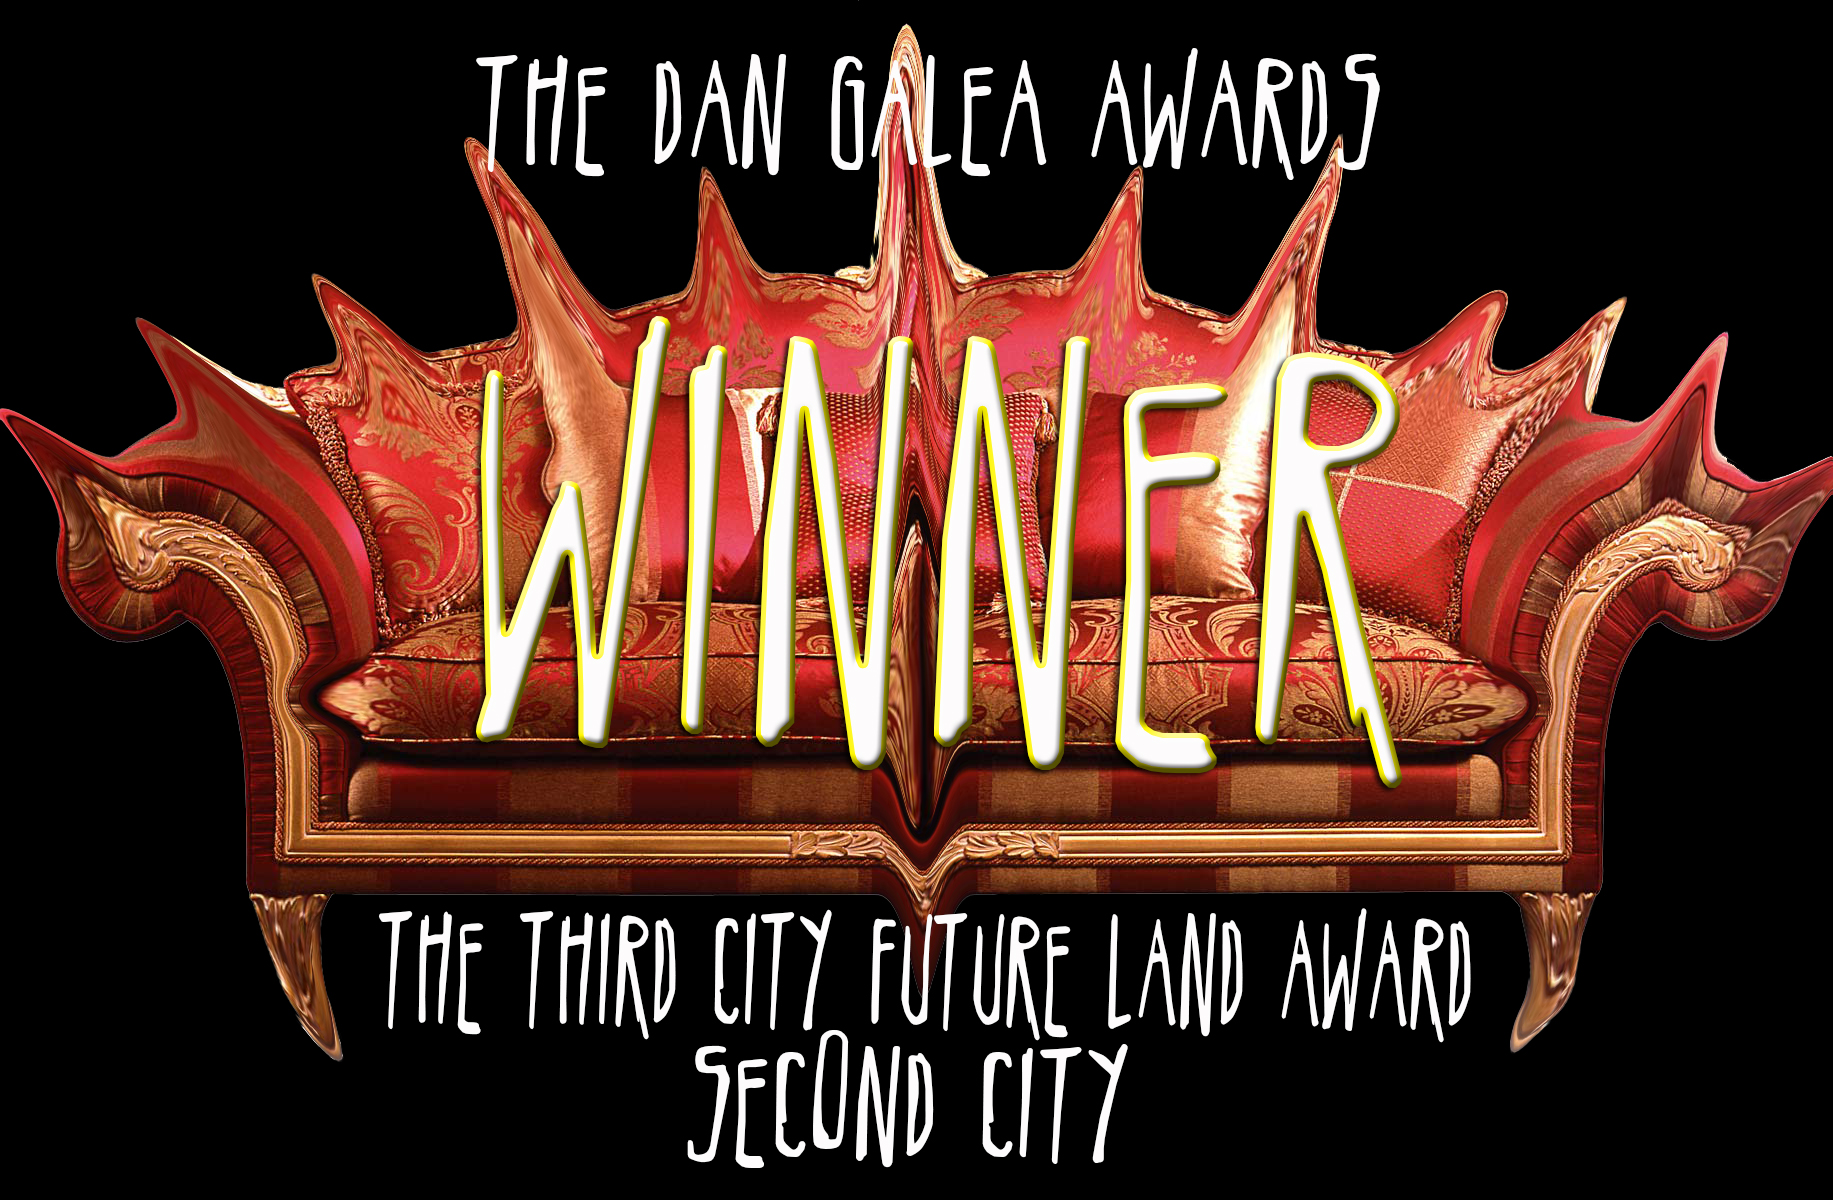 DGawards Second City.jpg